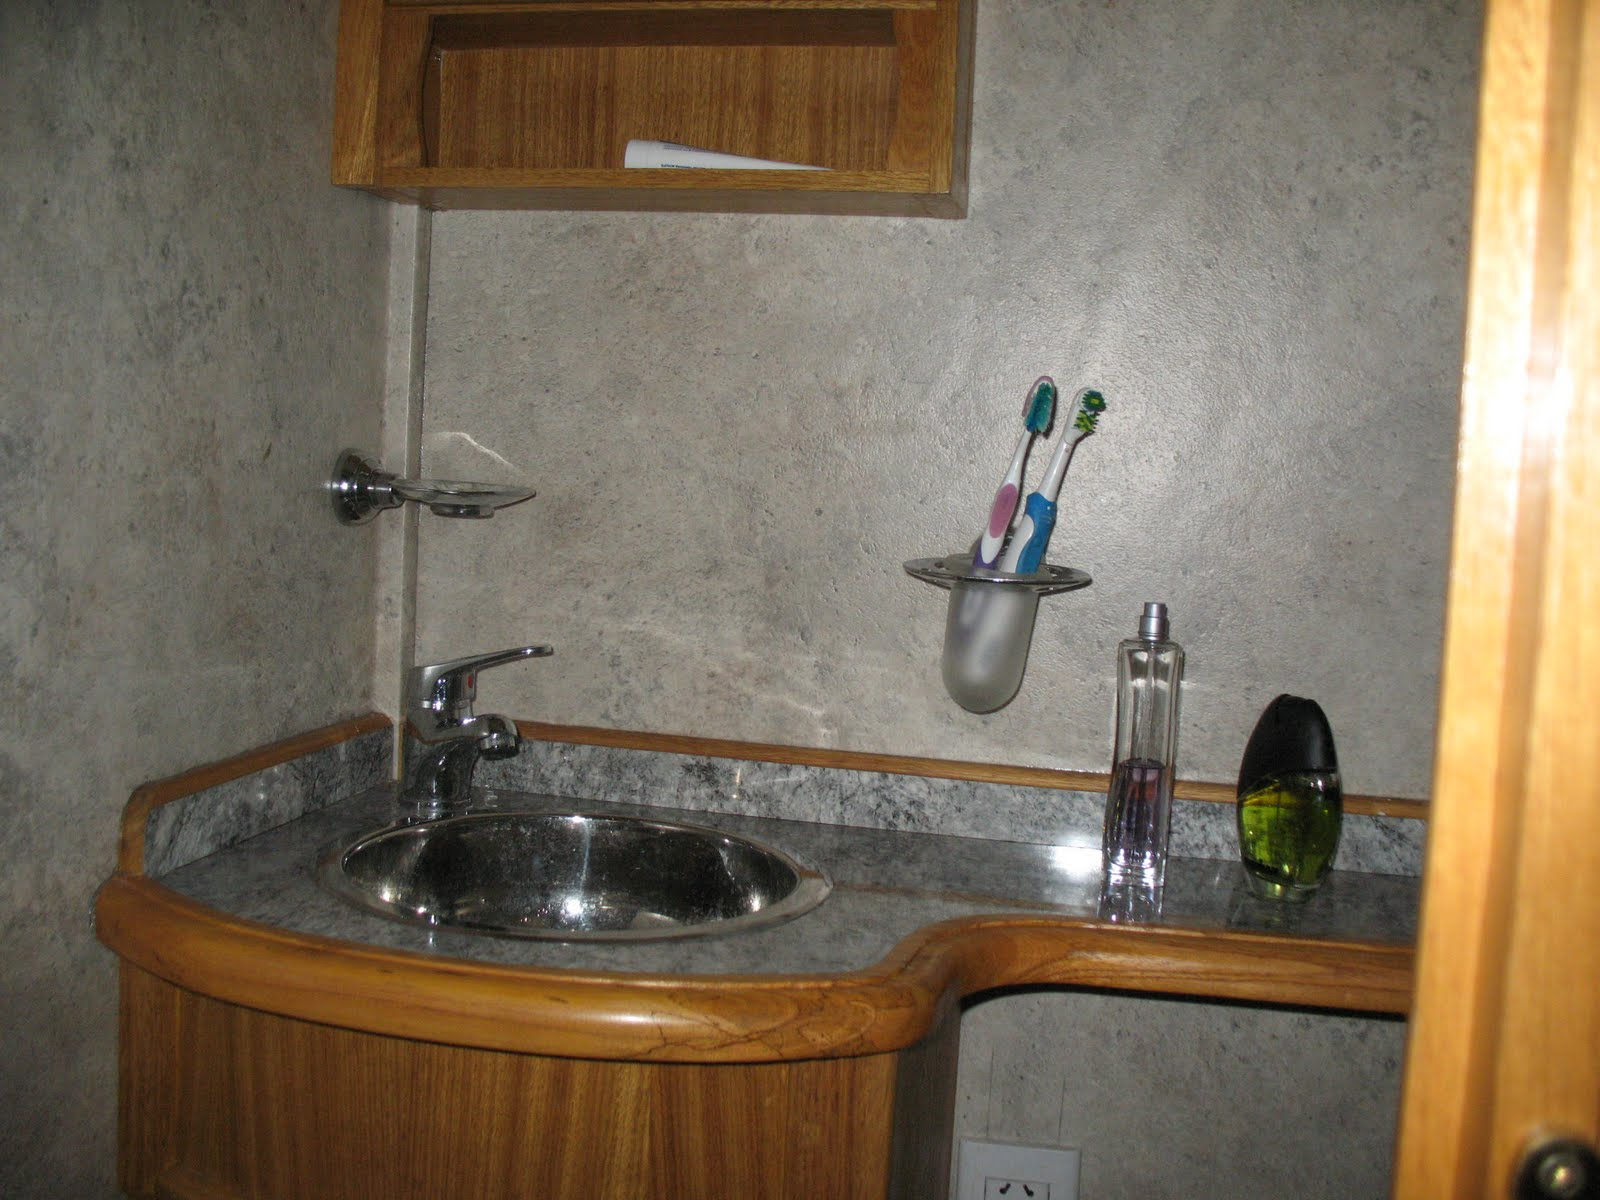 Botiquin Para Baño En Pvc:Bacha de pileta de baño en acero inoxidable, griferia Fv monocomando